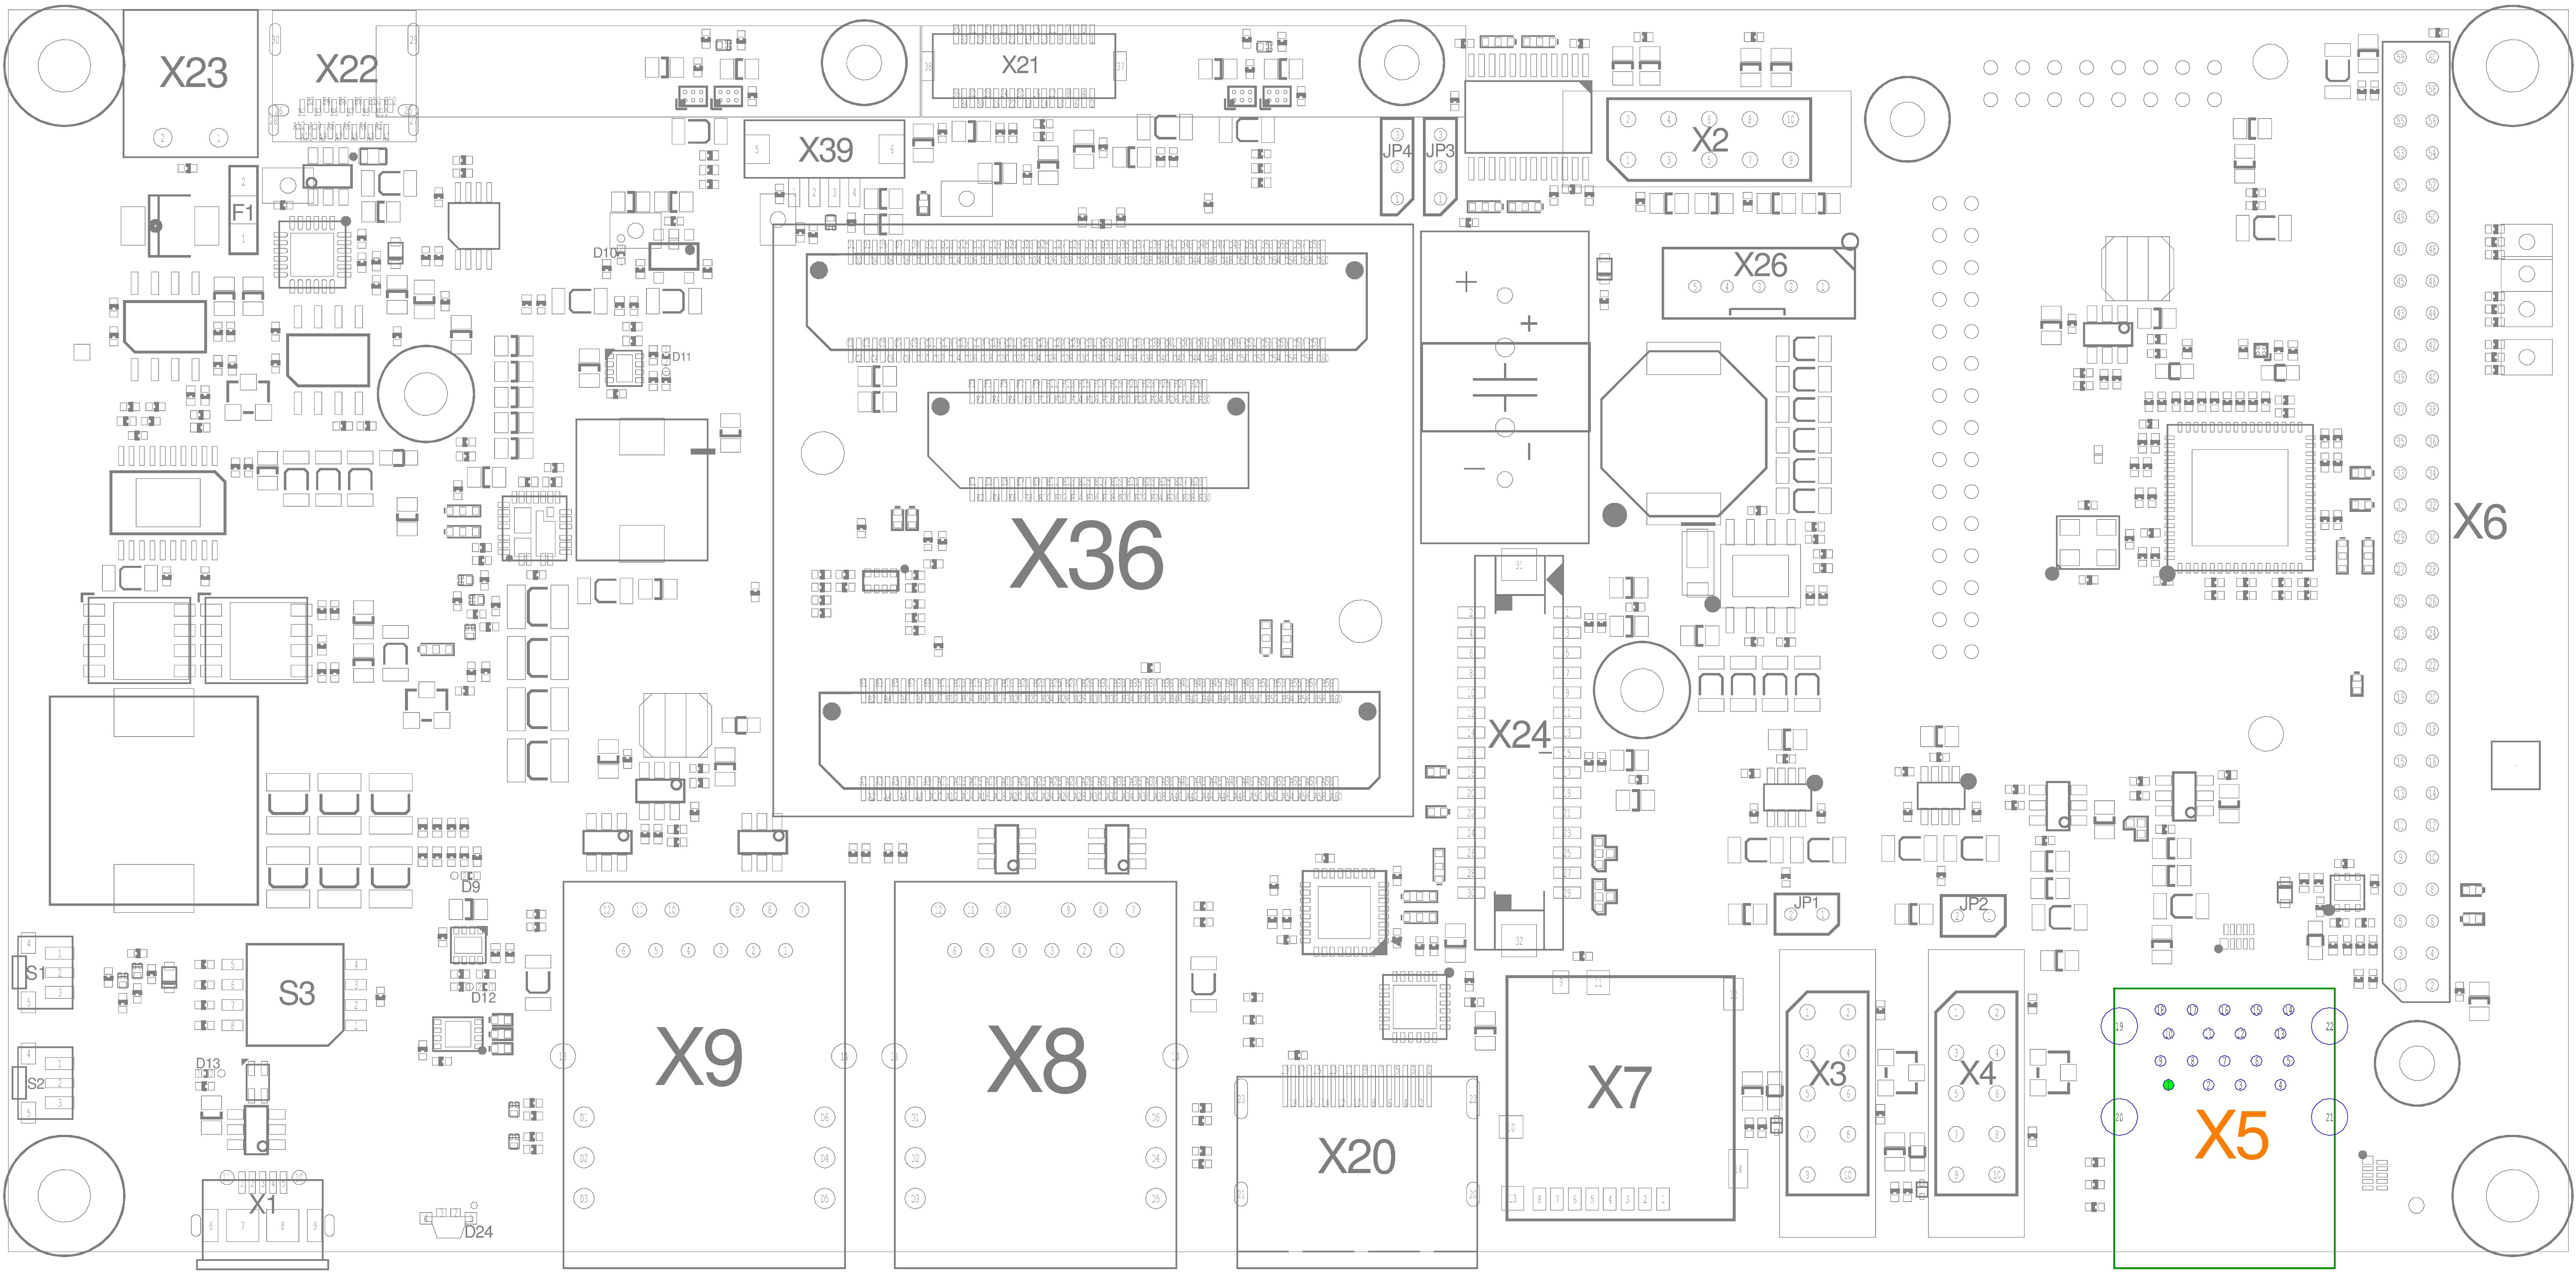 USB Interfaces (X5)